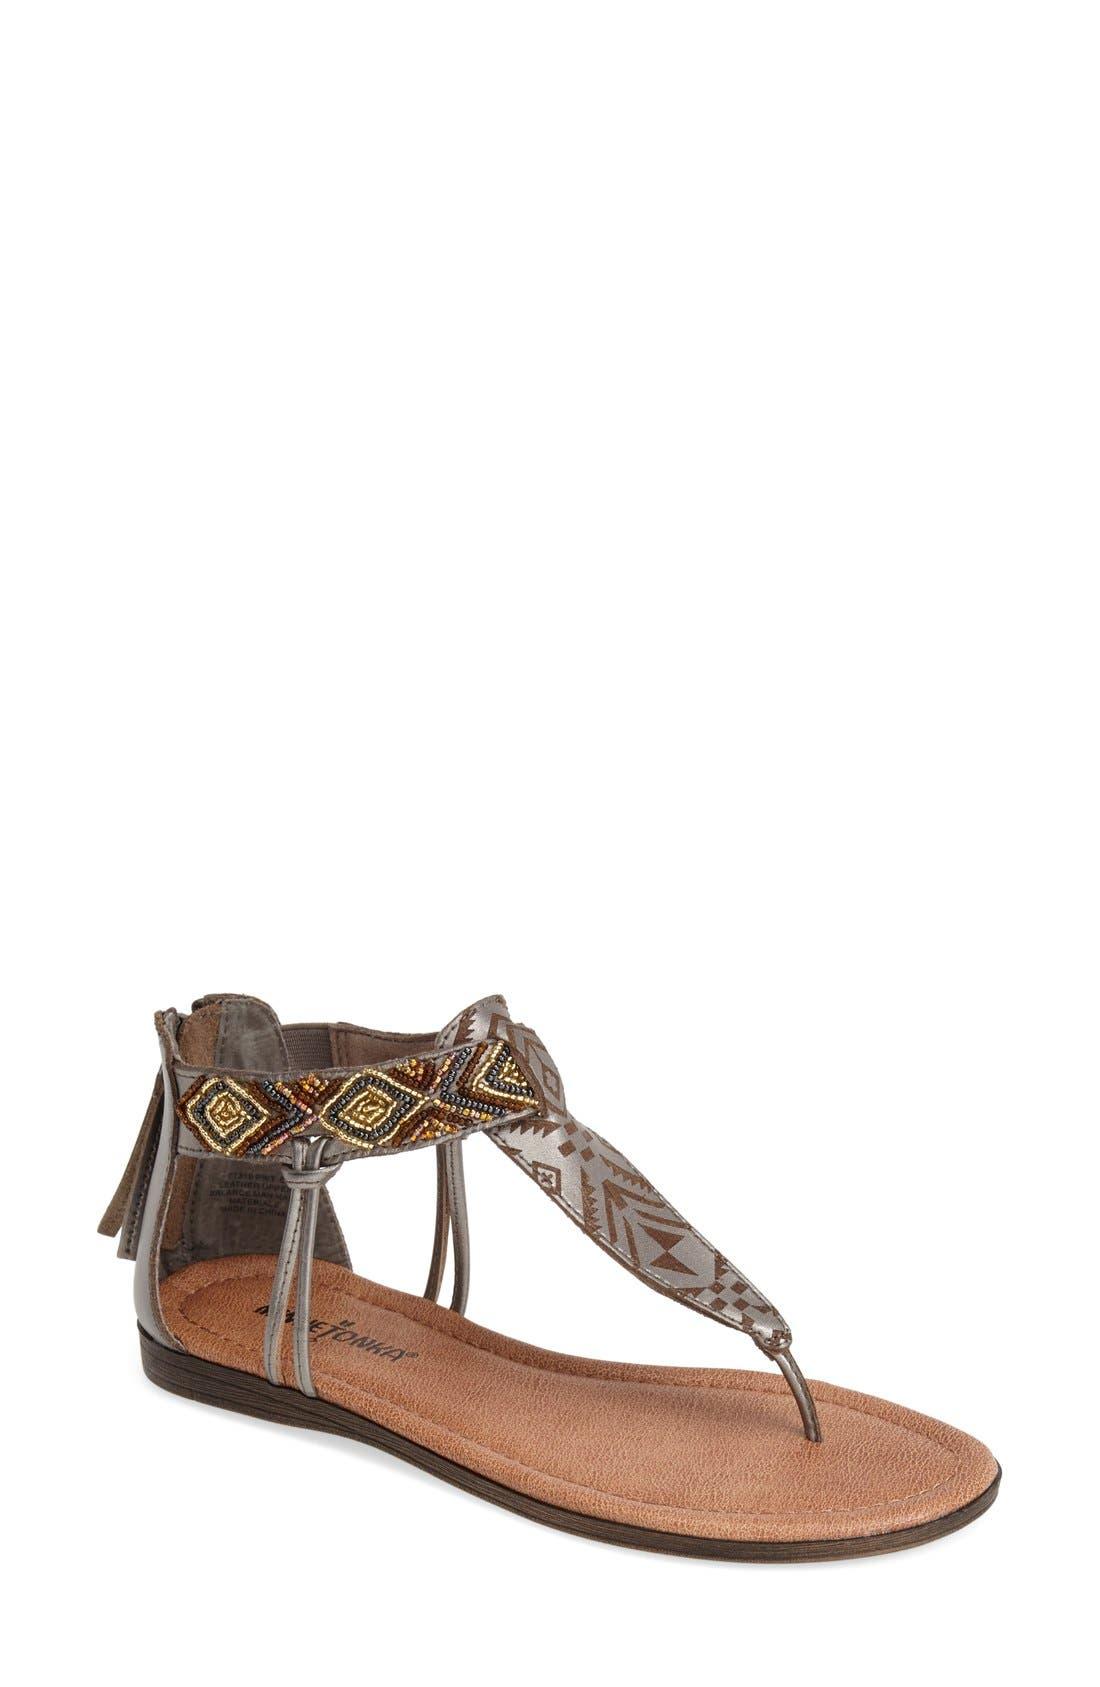 Alternate Image 1 Selected - Minnetonka 'Antigua' Beaded Thong Sandal (Women)